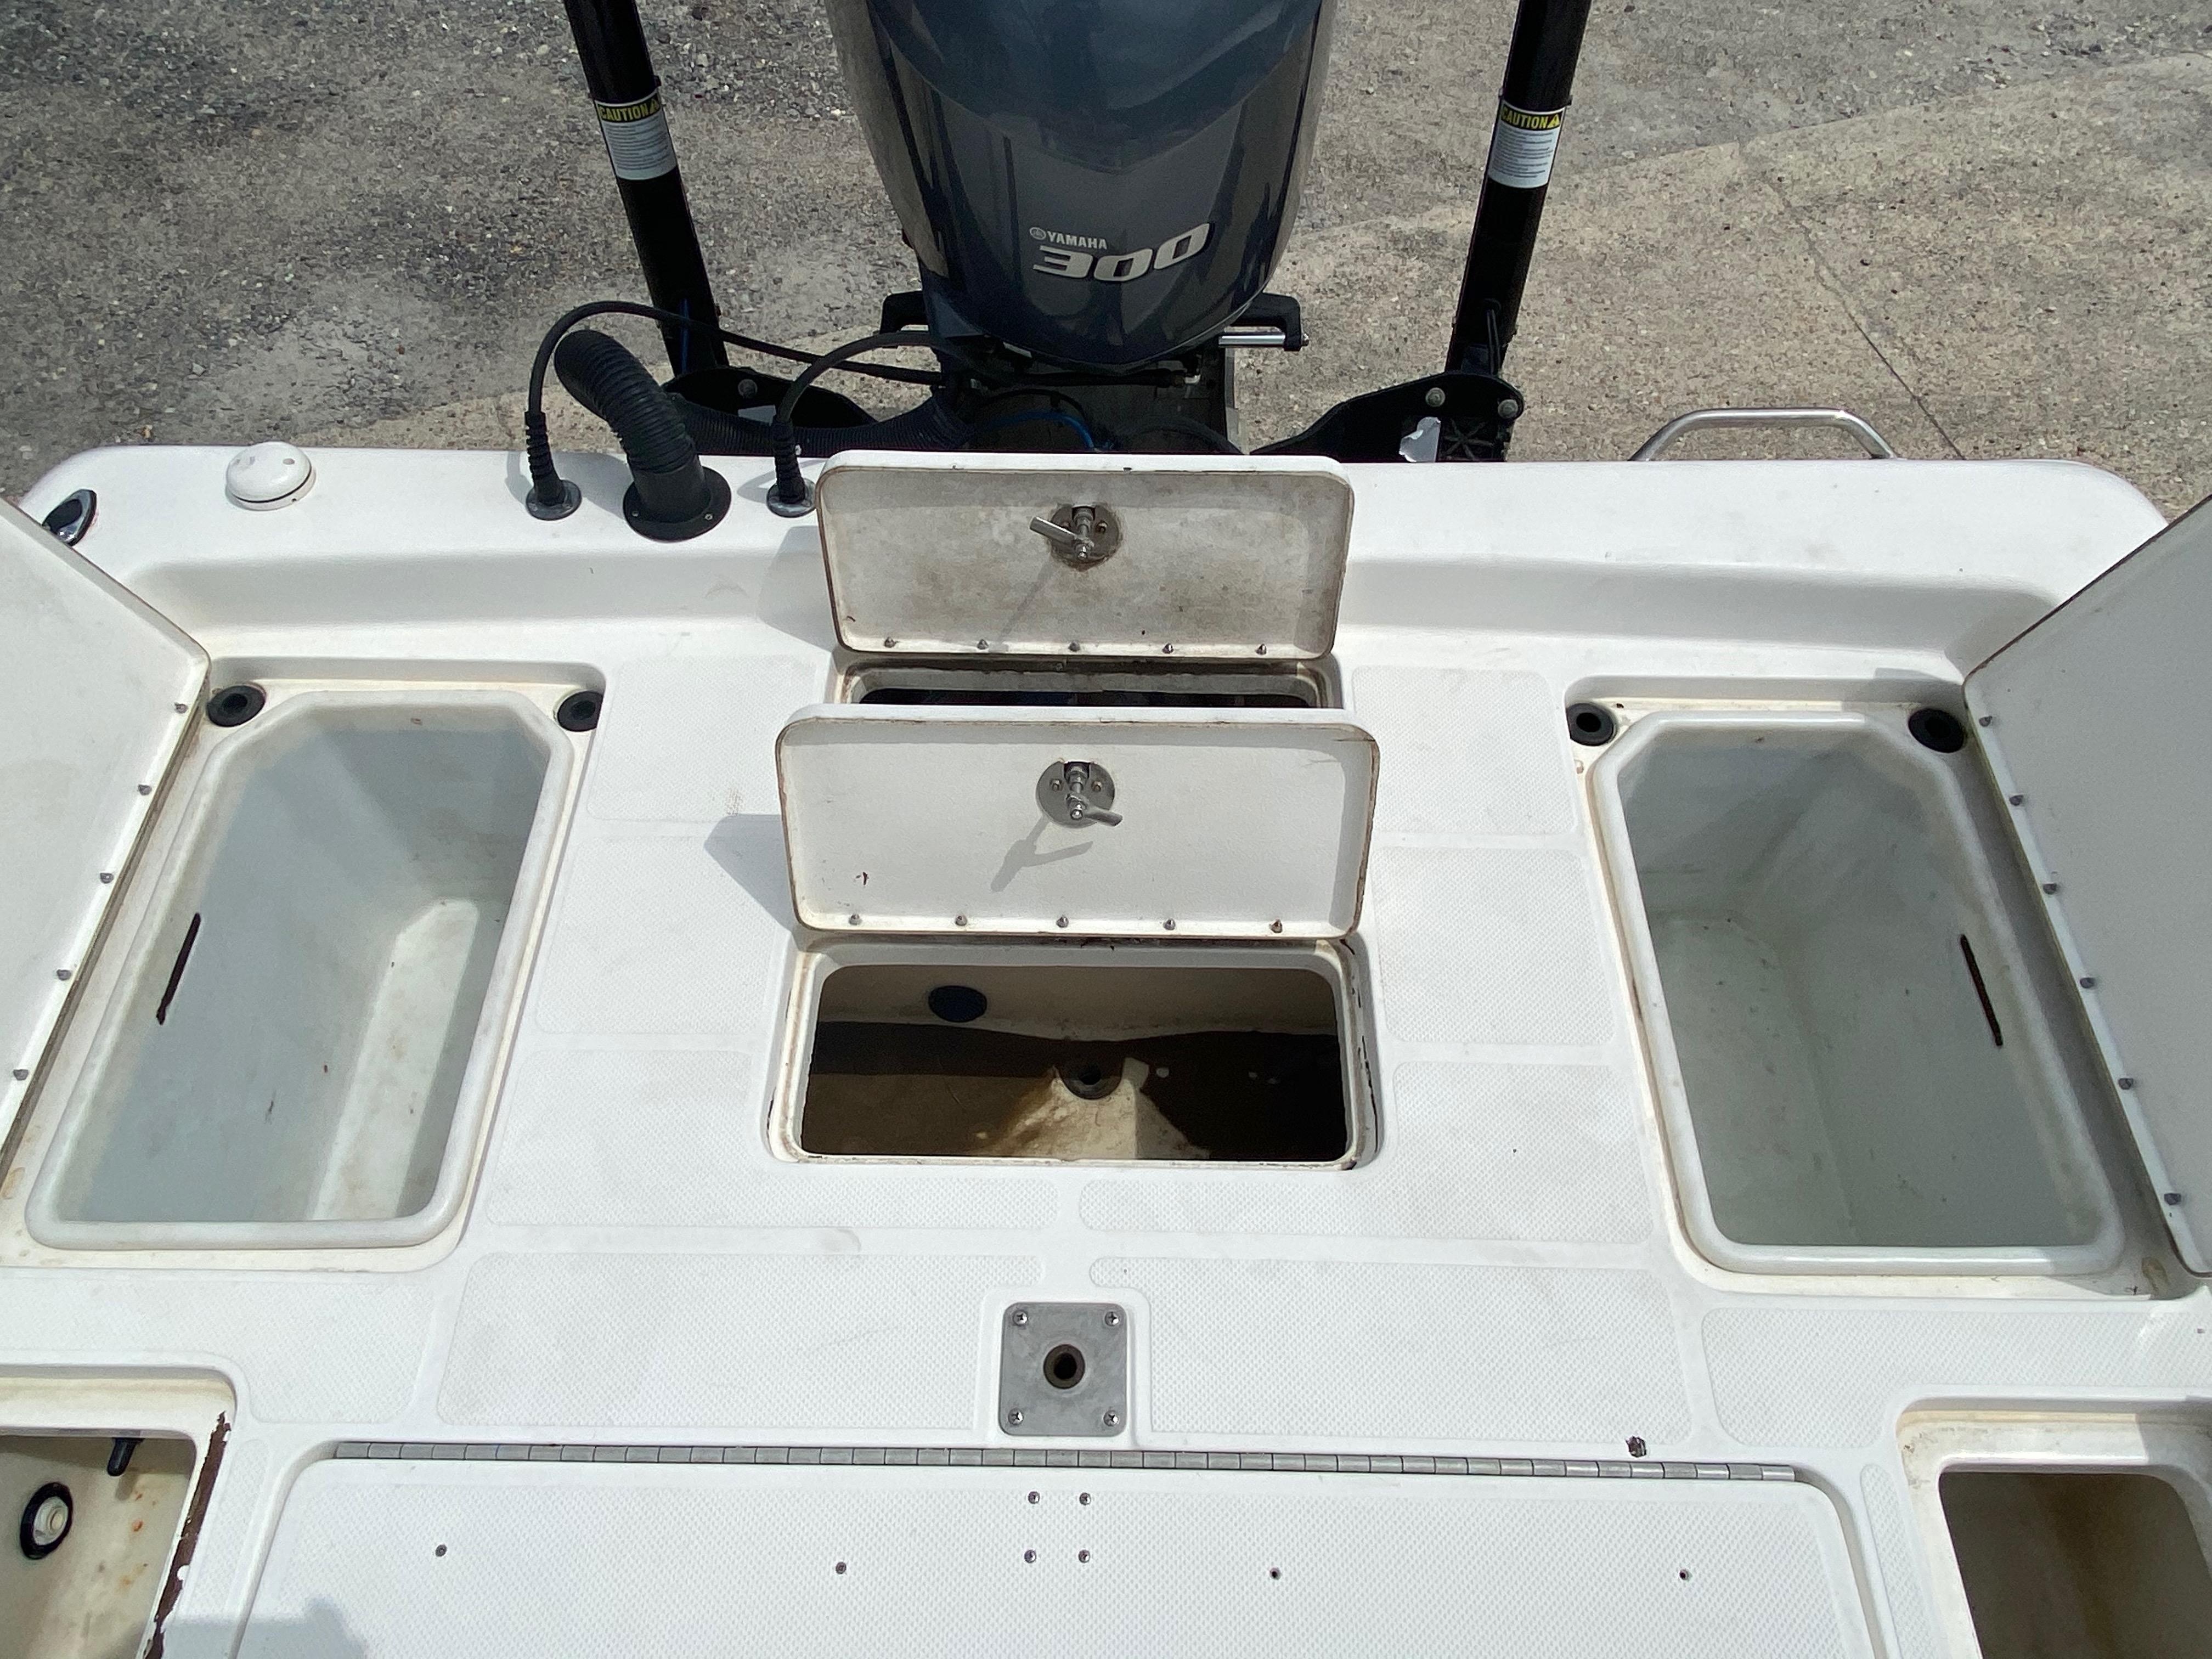 2010 Skeeter boat for sale, model of the boat is ZX 24V & Image # 15 of 18